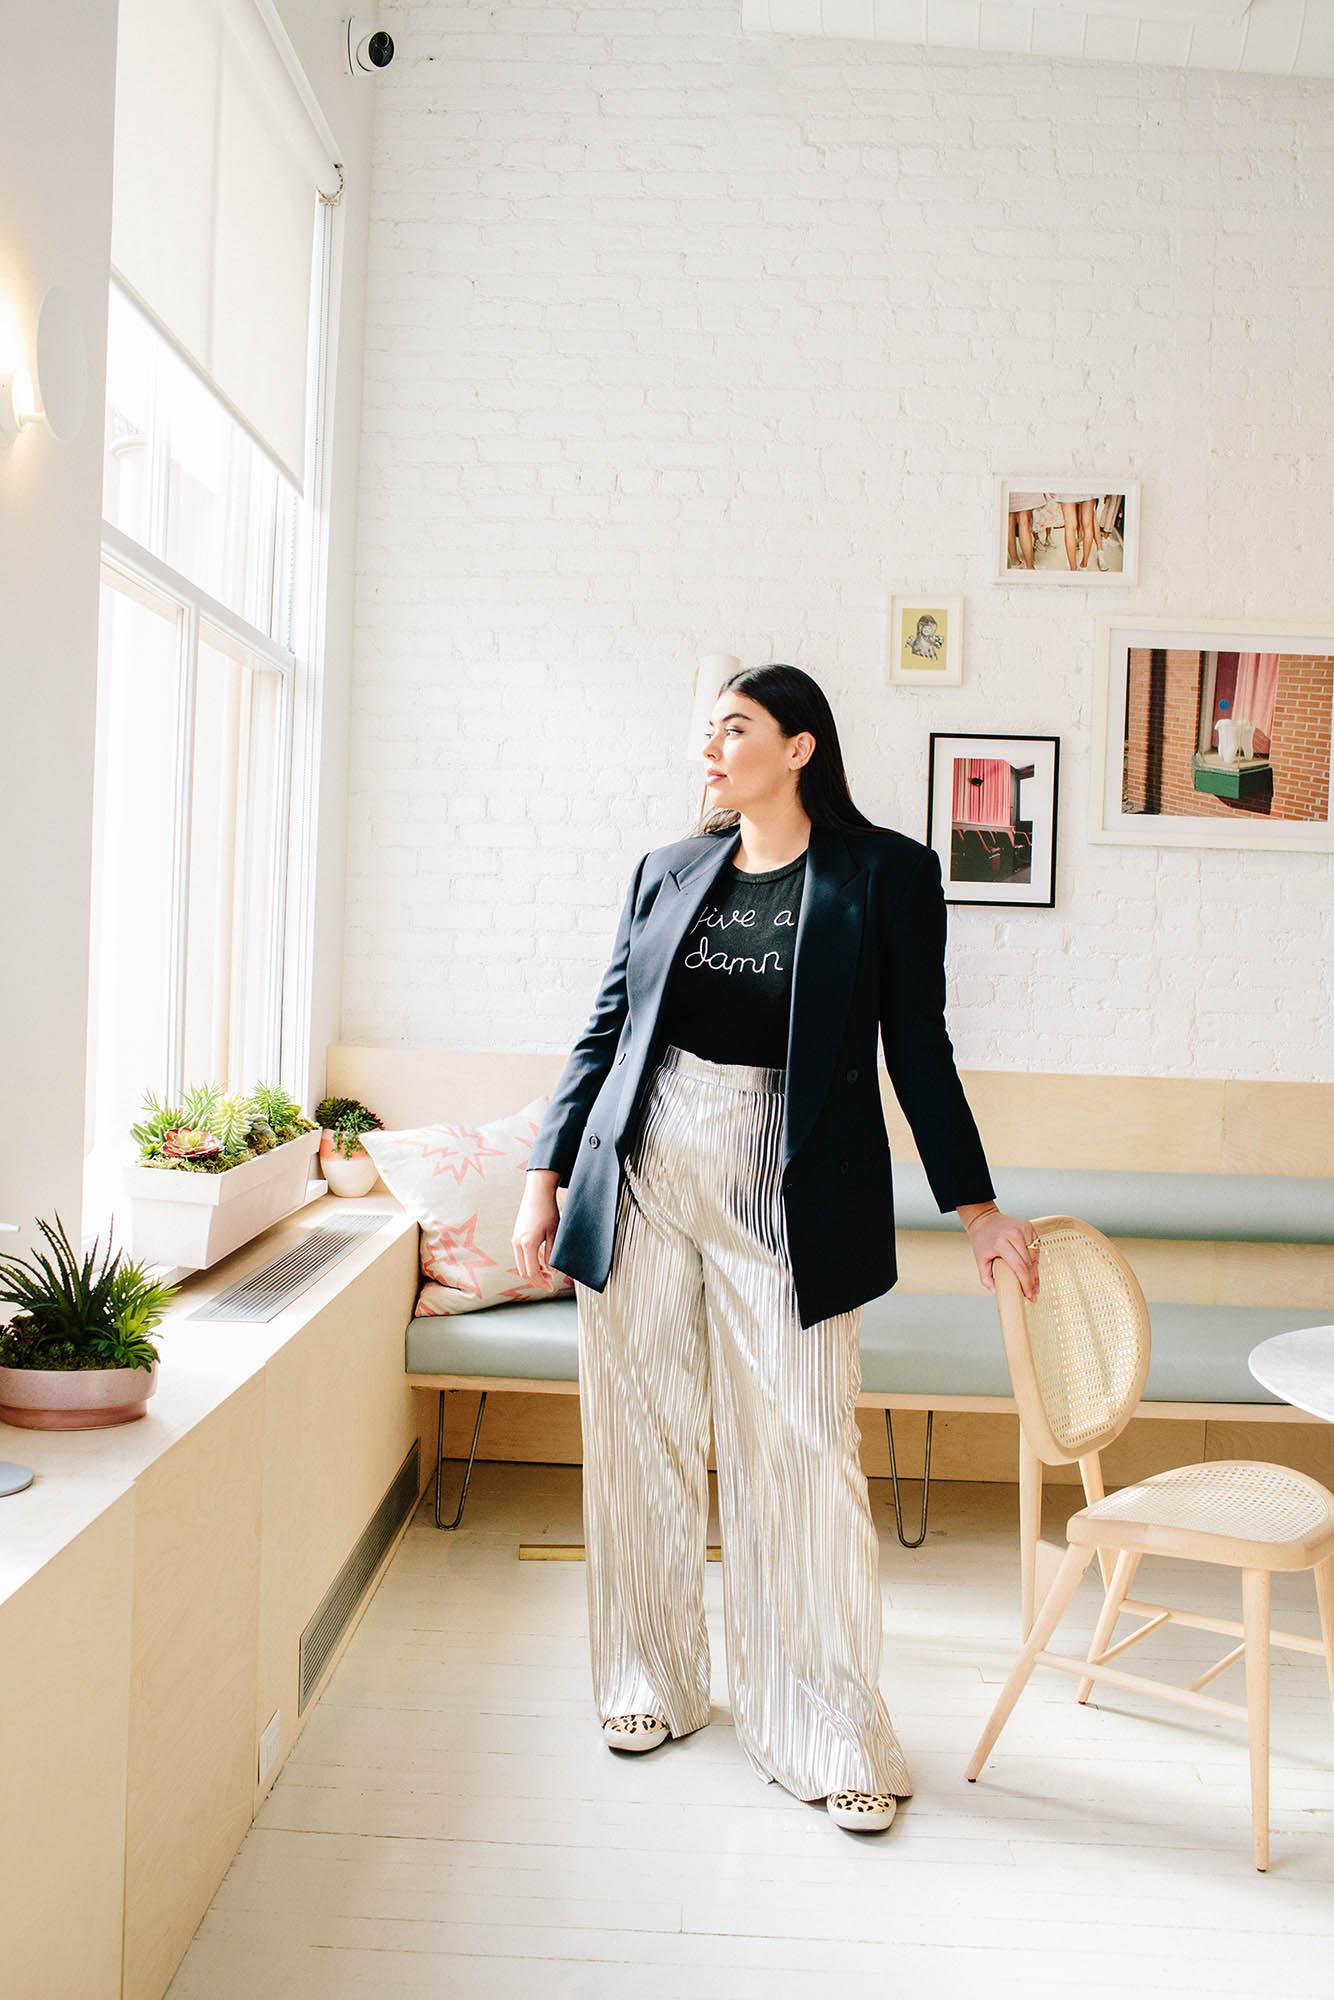 Lauren Chan / The Globe & Mail